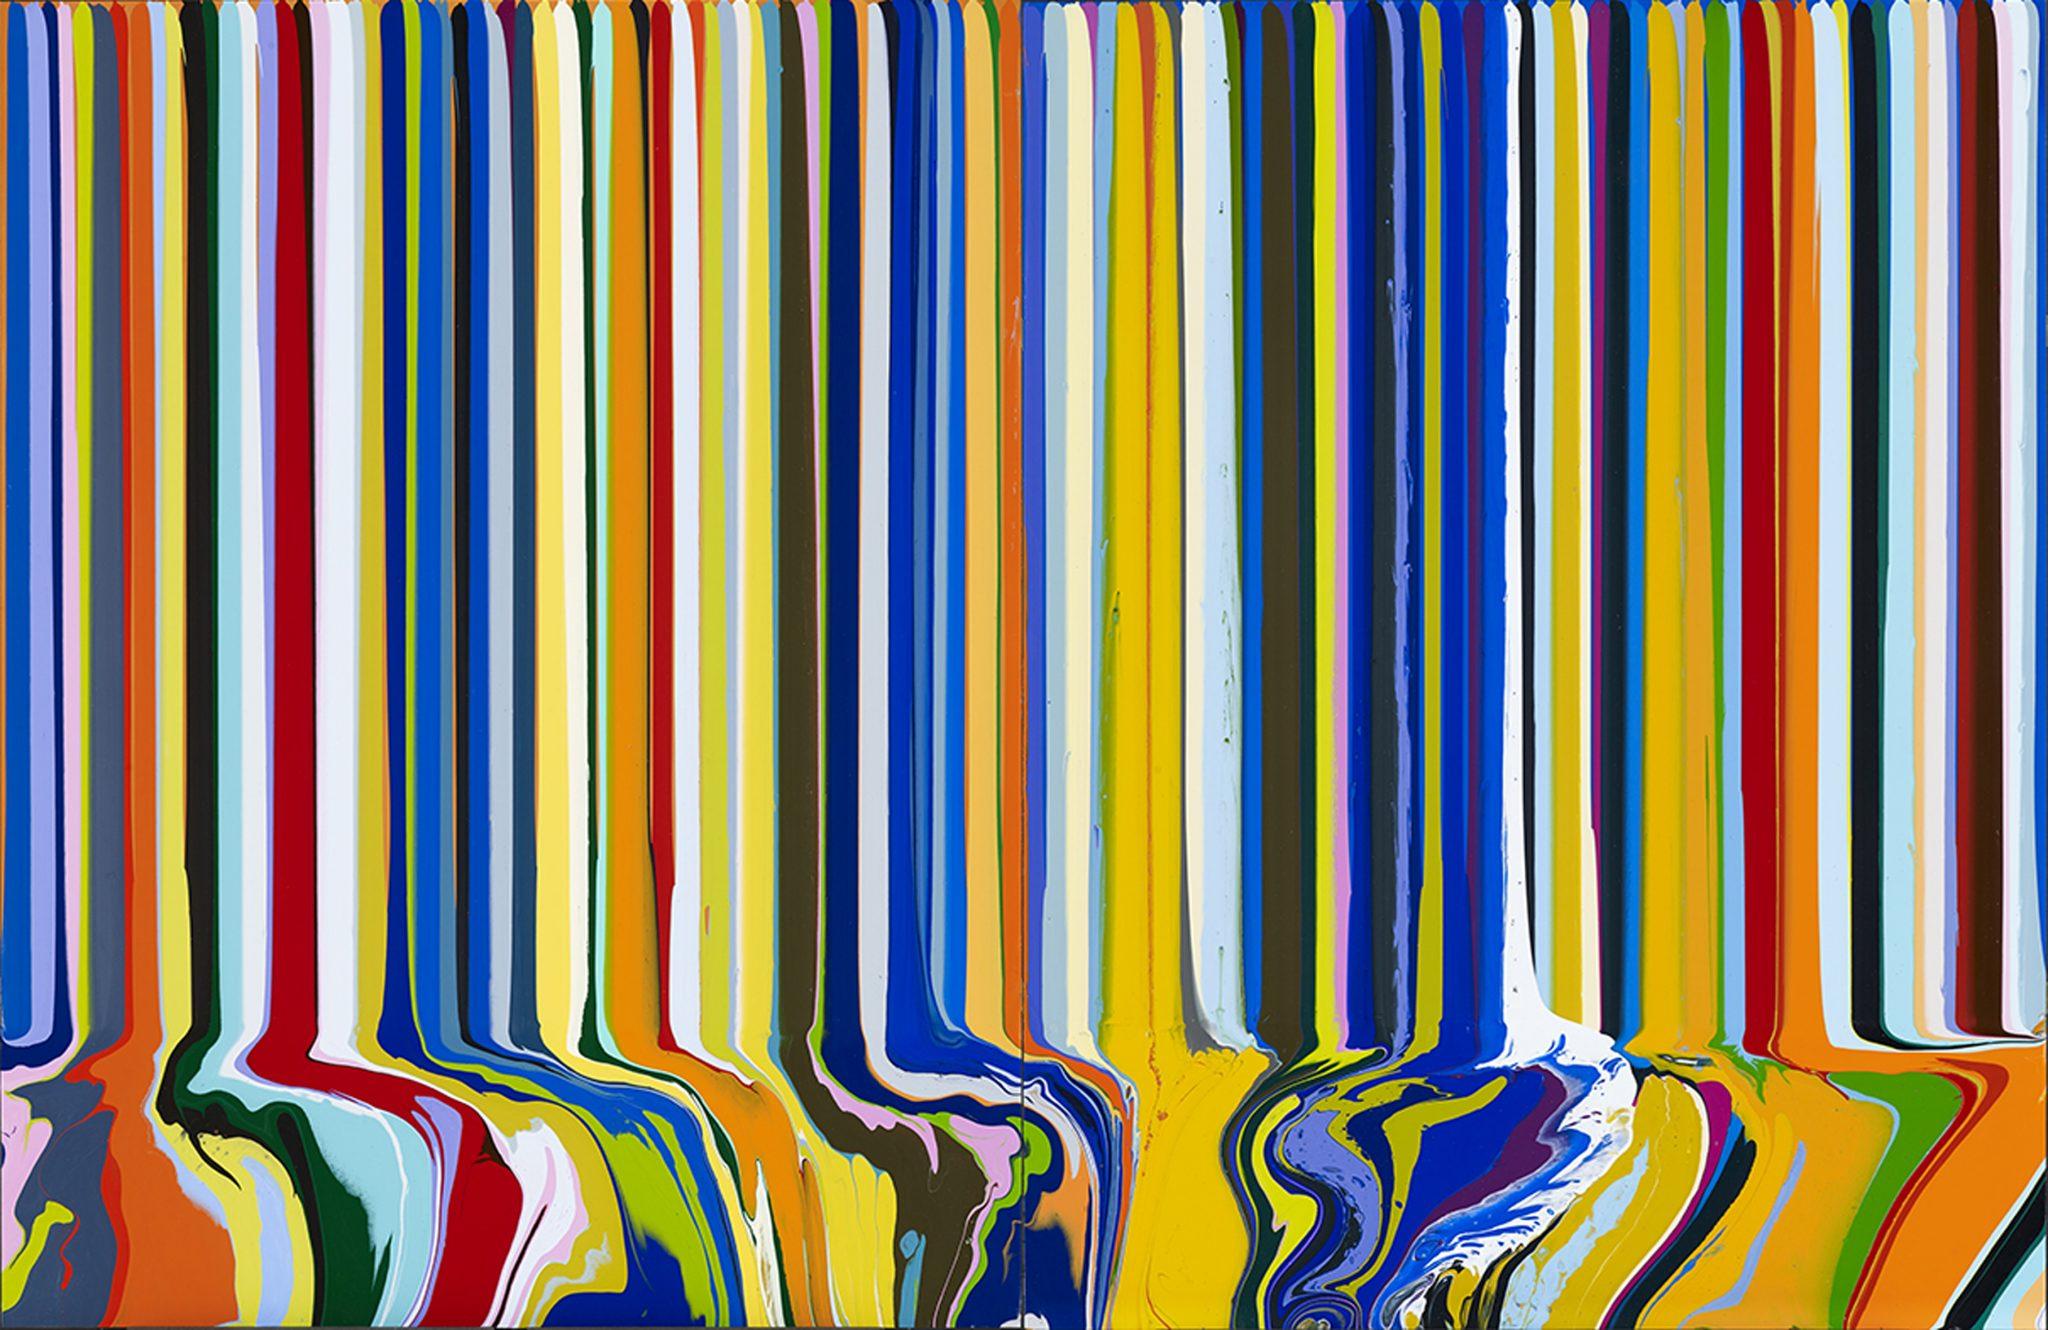 IAN DAVENPORT COLOURCADE : ORANGE & BLUE, 2015 ACRYLIC ON ALUMINIUM MOUNTED ON TWO ALUMINIUM PANELS 103X158 CM COURTESY GALLERIA TEGA,MILANO PHOTO: GALLERIA TEGA , MILANO